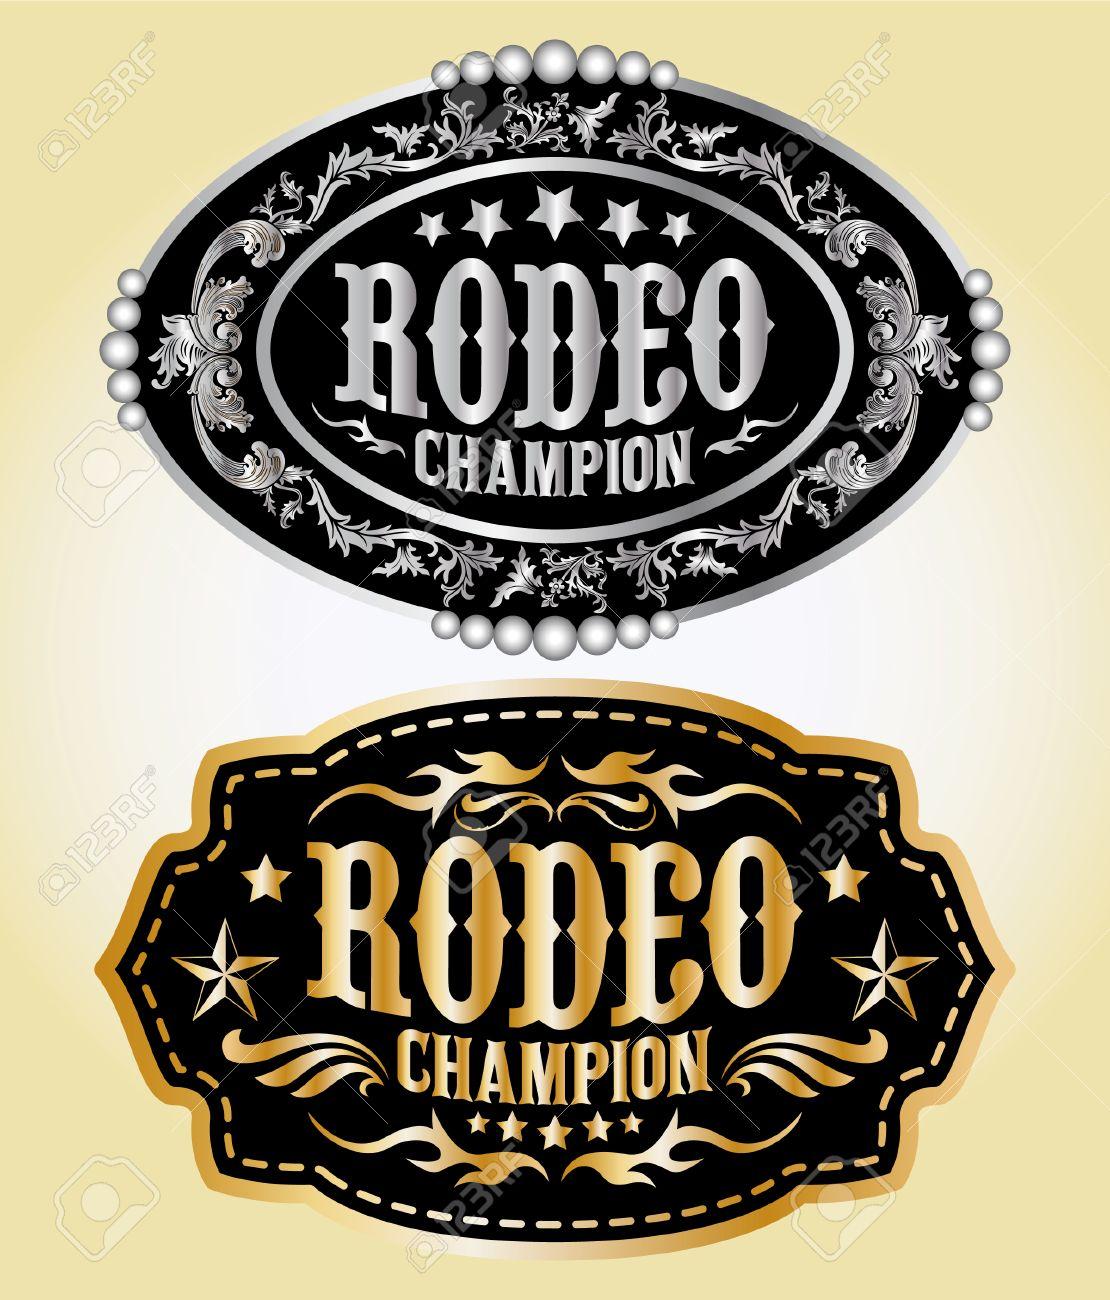 Rodeo Champion - cowboy belt buckle vector design - 26532643